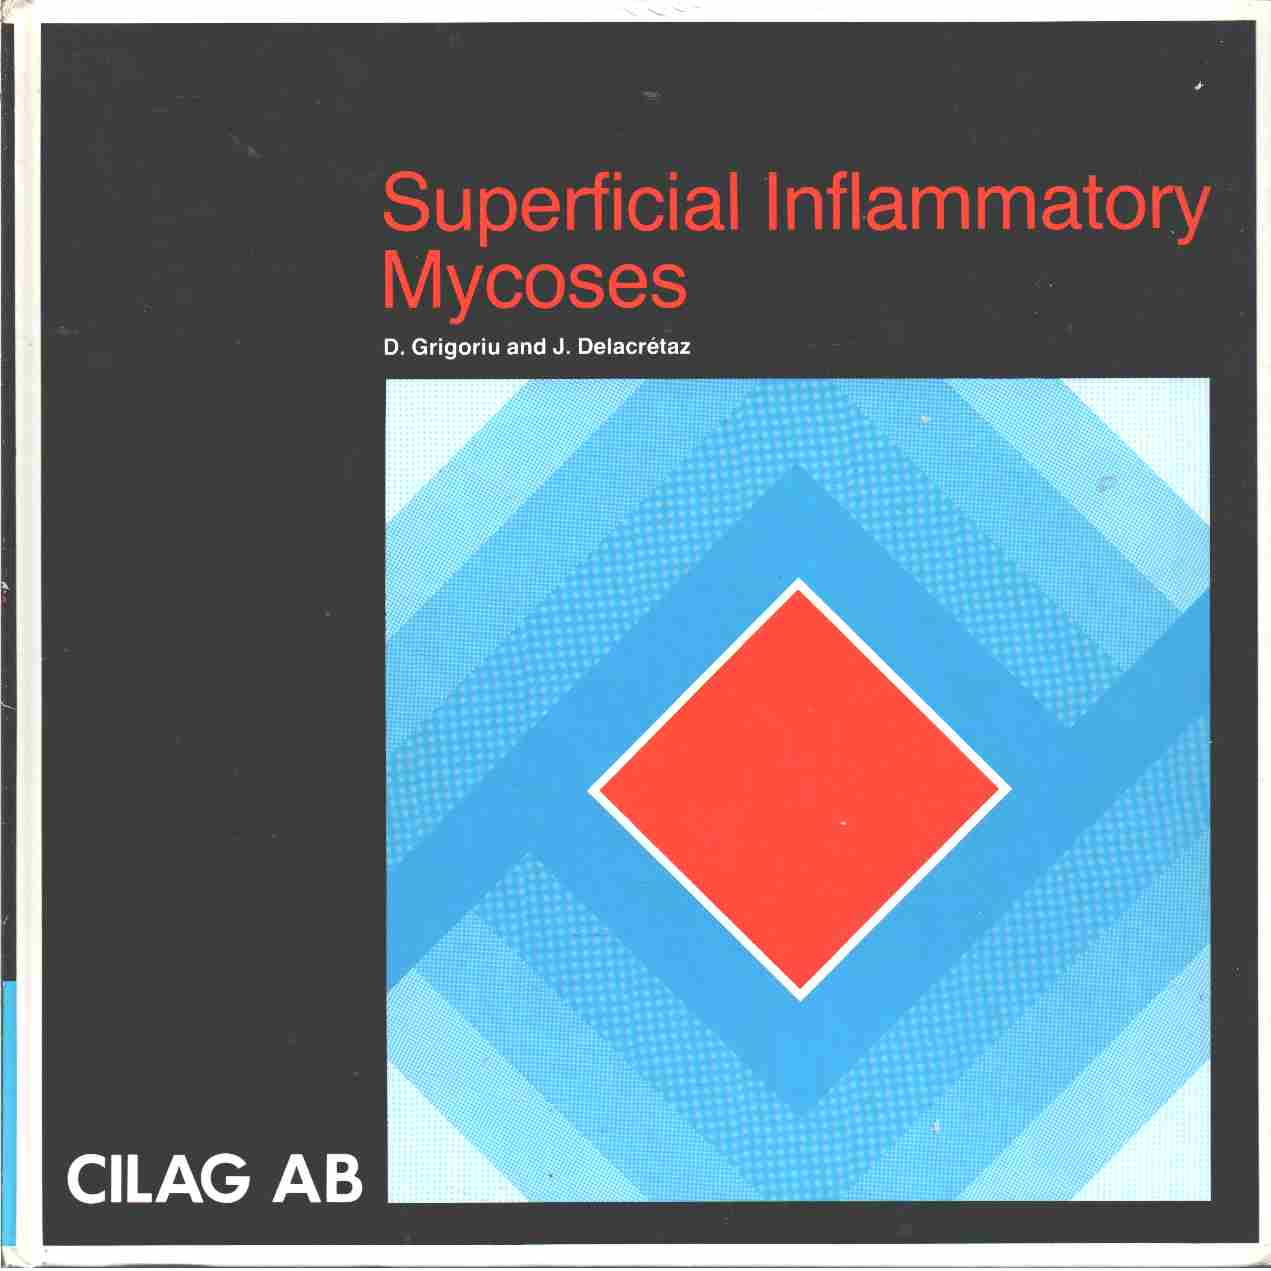 Superficial Inflammatory Mycoses  - Grigoriu, D.  and Delacretaz J.